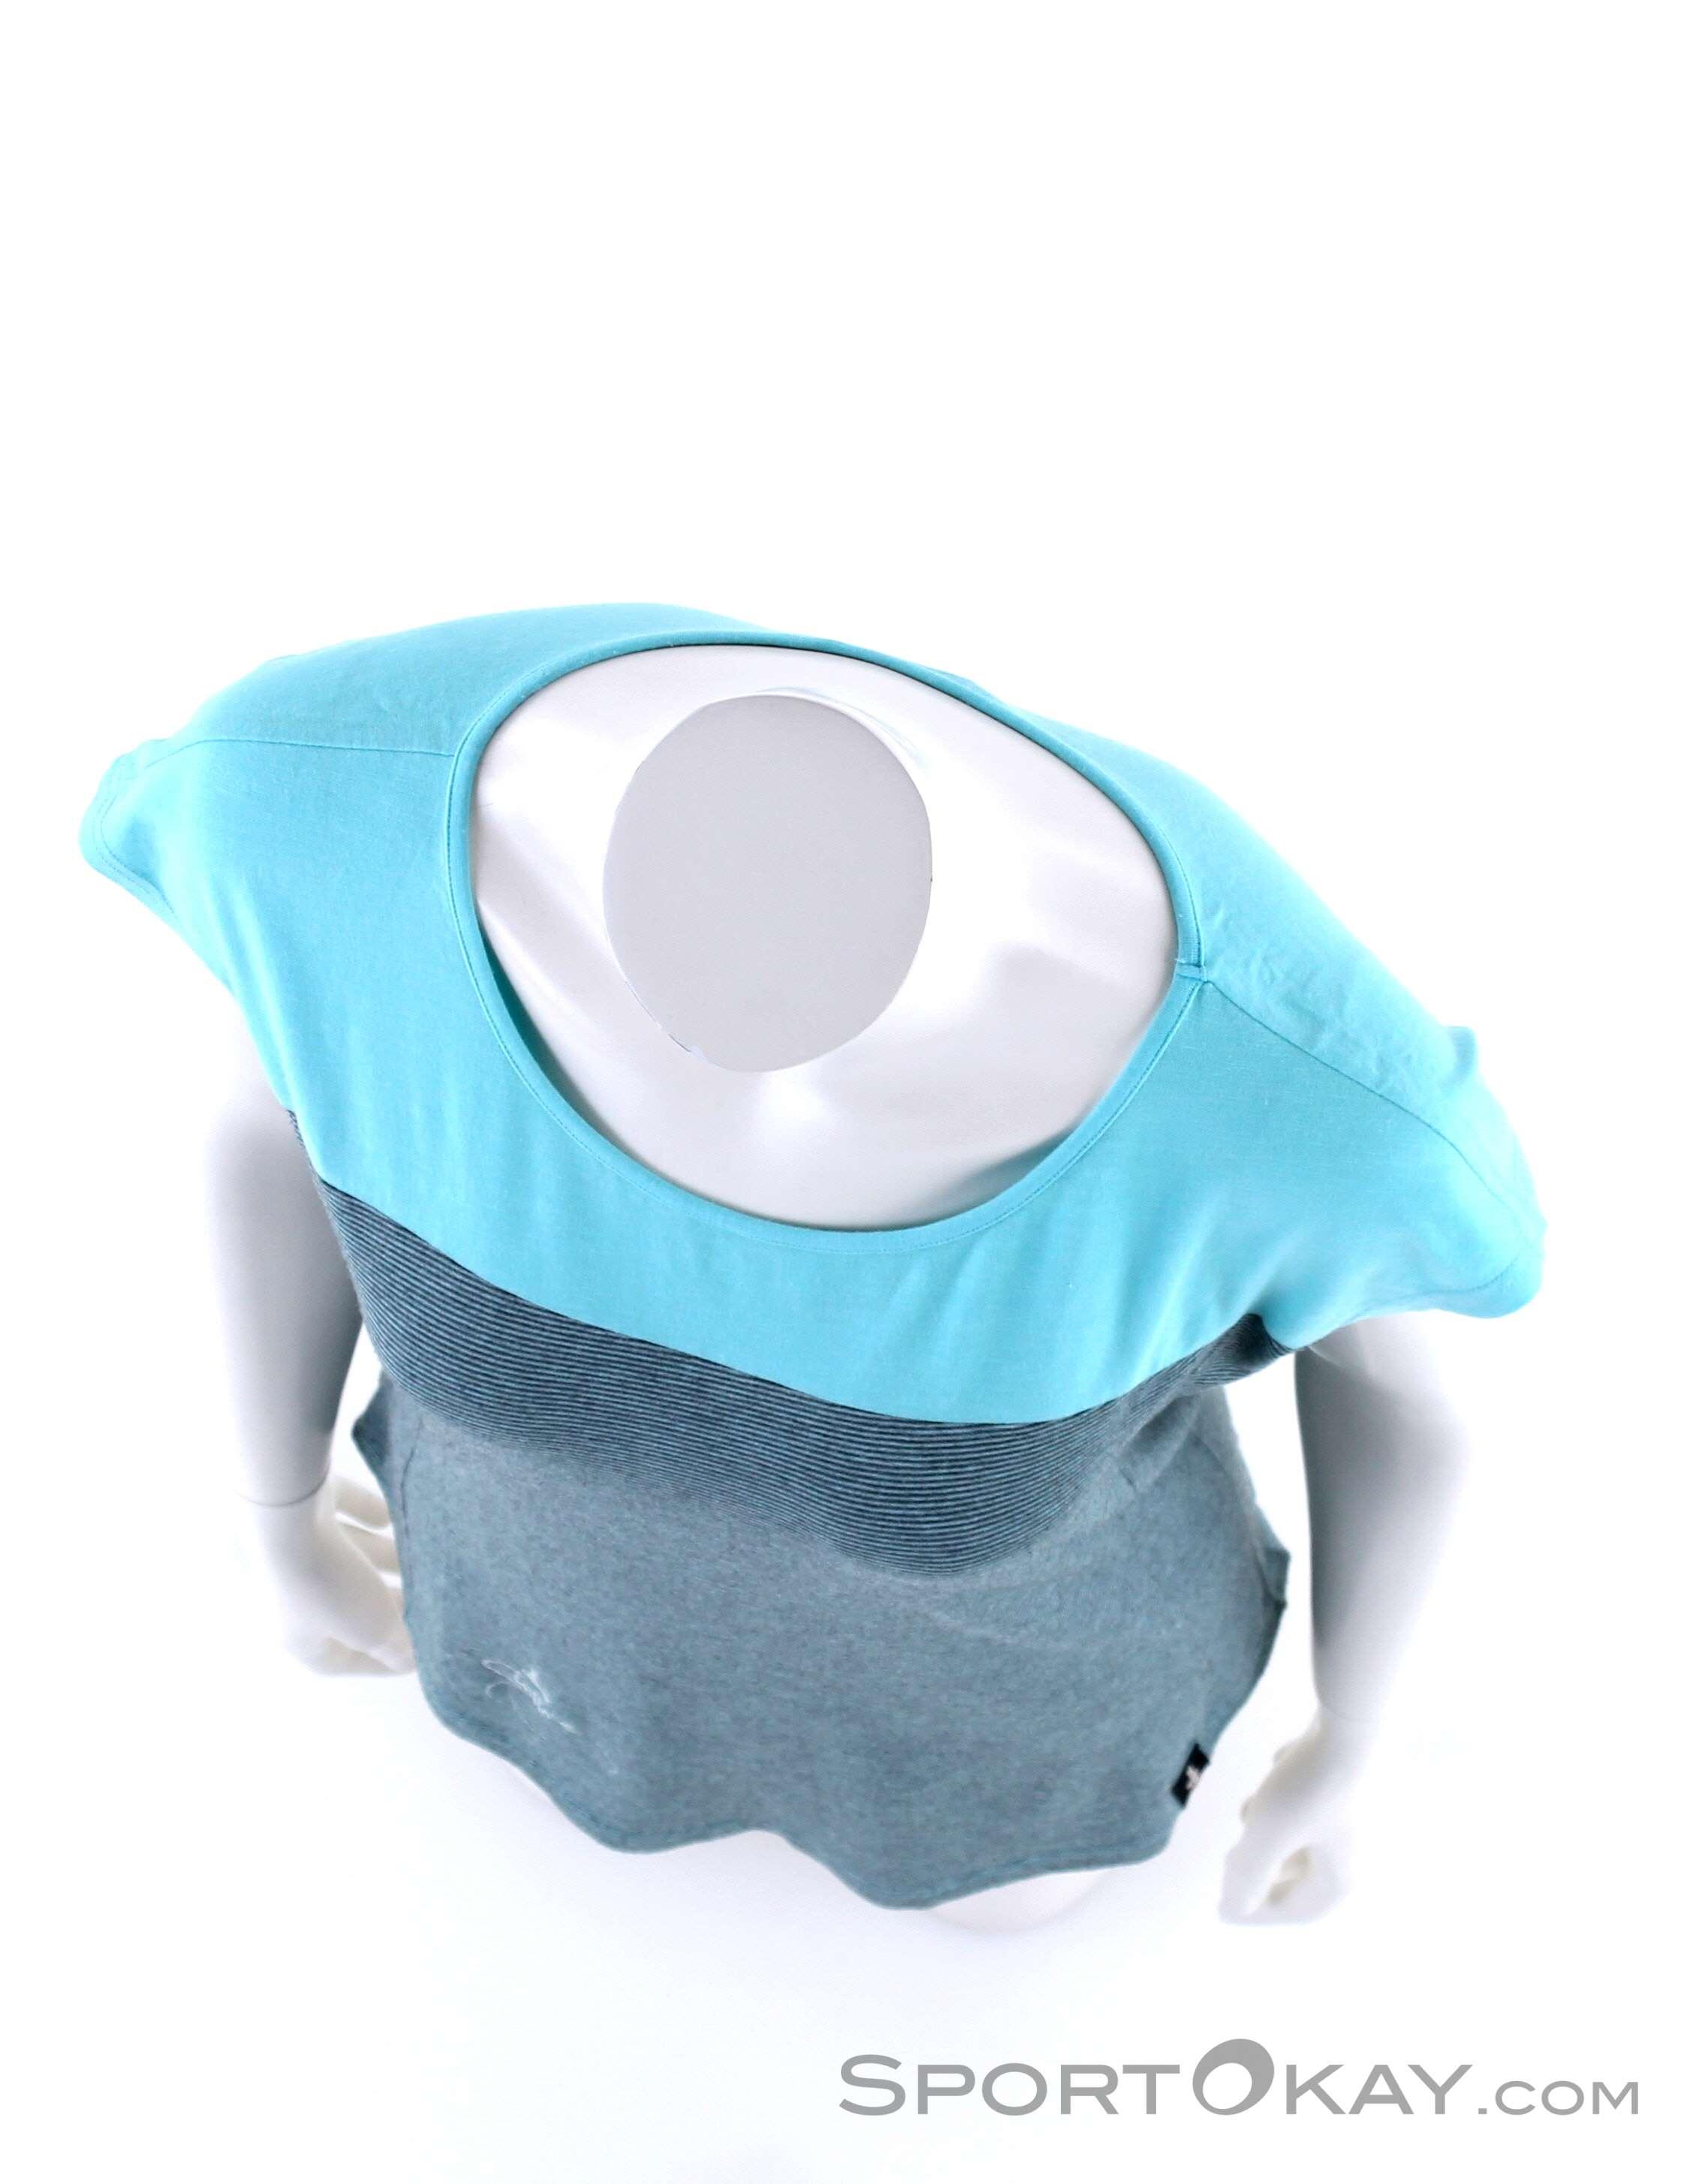 16e1c46610 Chillaz Biella Deer Logo Womens T-Shirt, Chillaz, Blue, , Female,